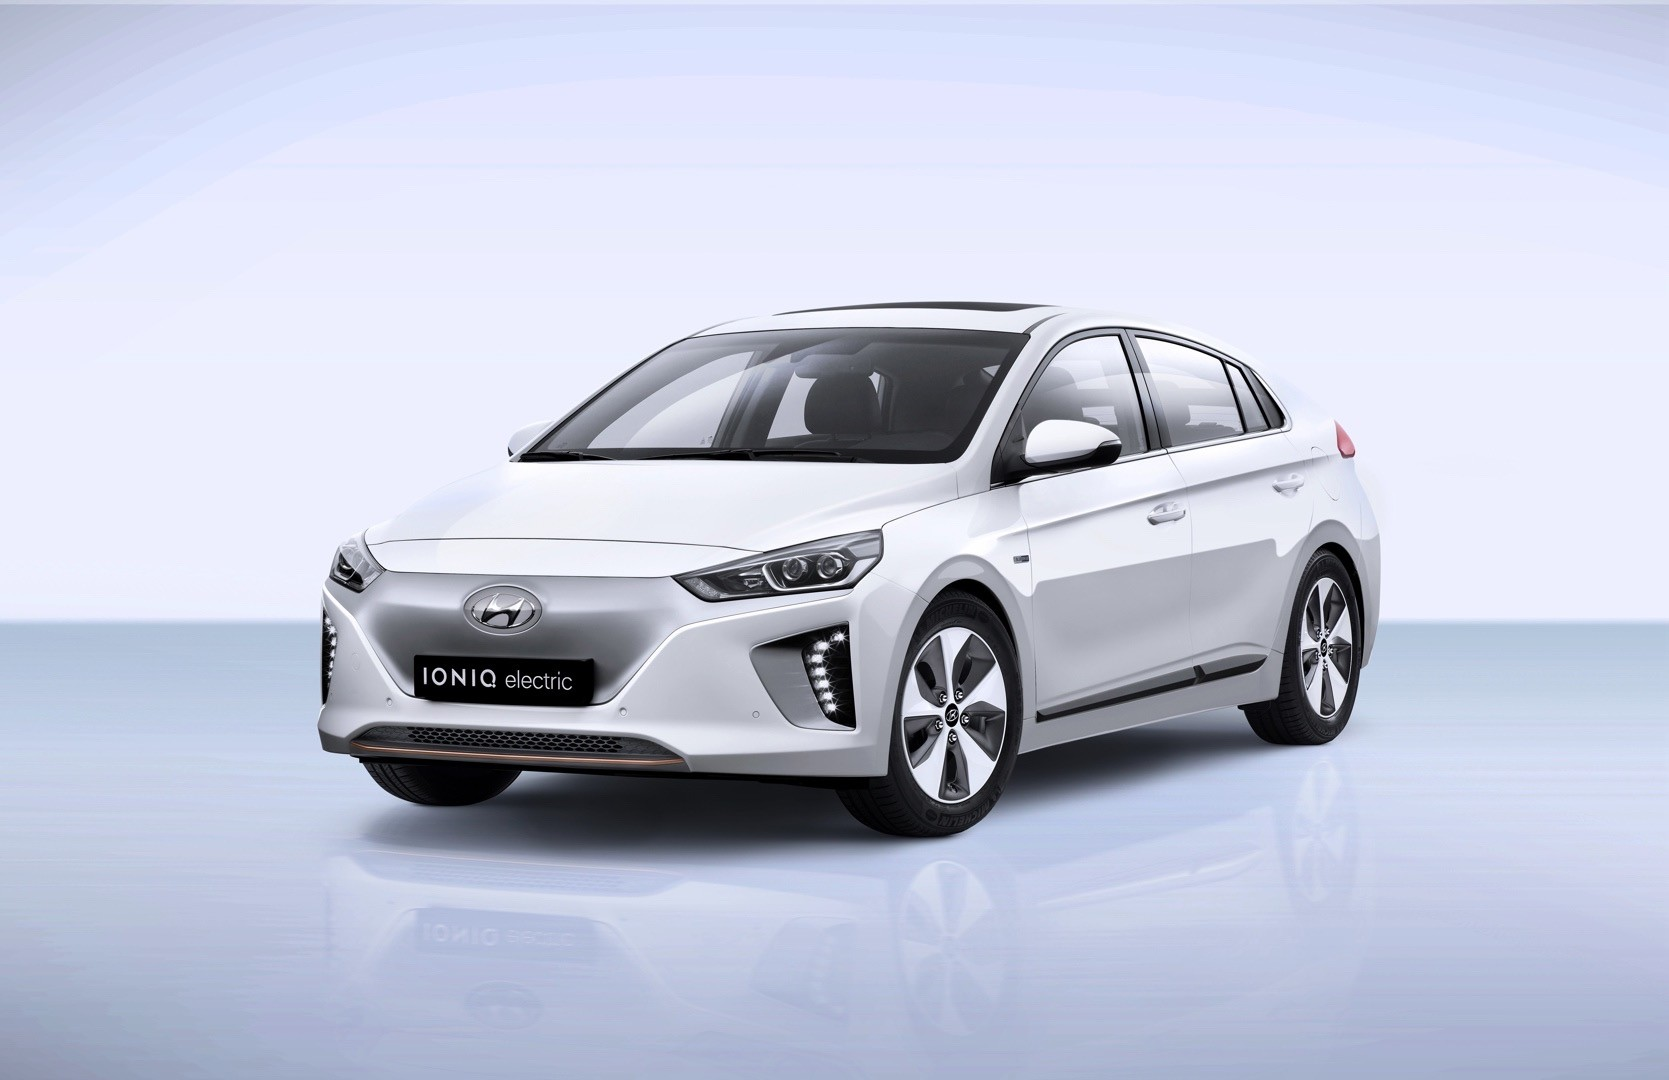 Fuel Economy Wars: 2017 Hyundai Ioniq Beats Toyota Prius, BMW i3, Chevrolet Bolt - autoevolution